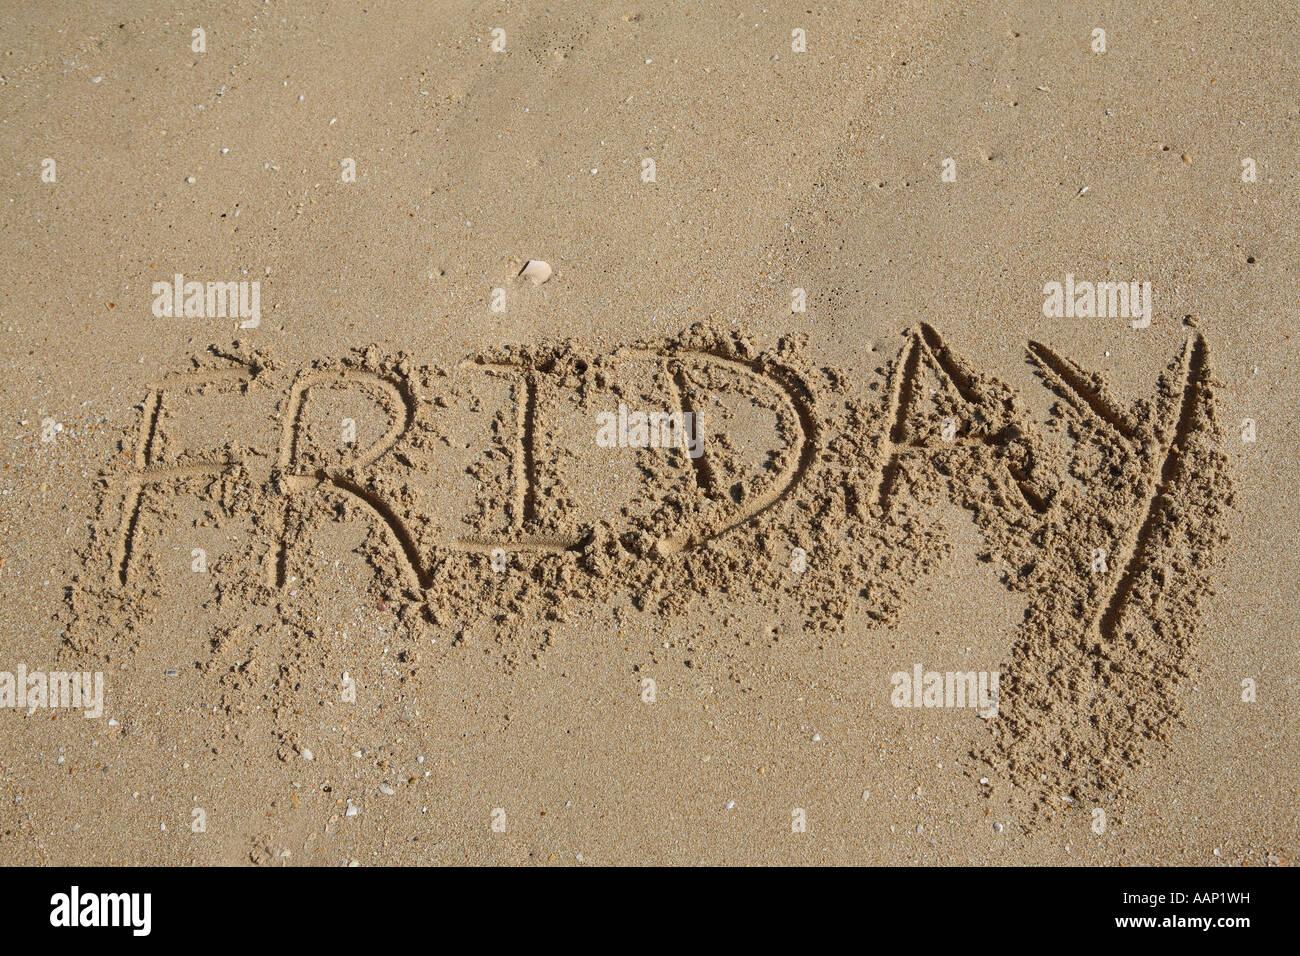 friday written on sand, weekdays - Stock Image